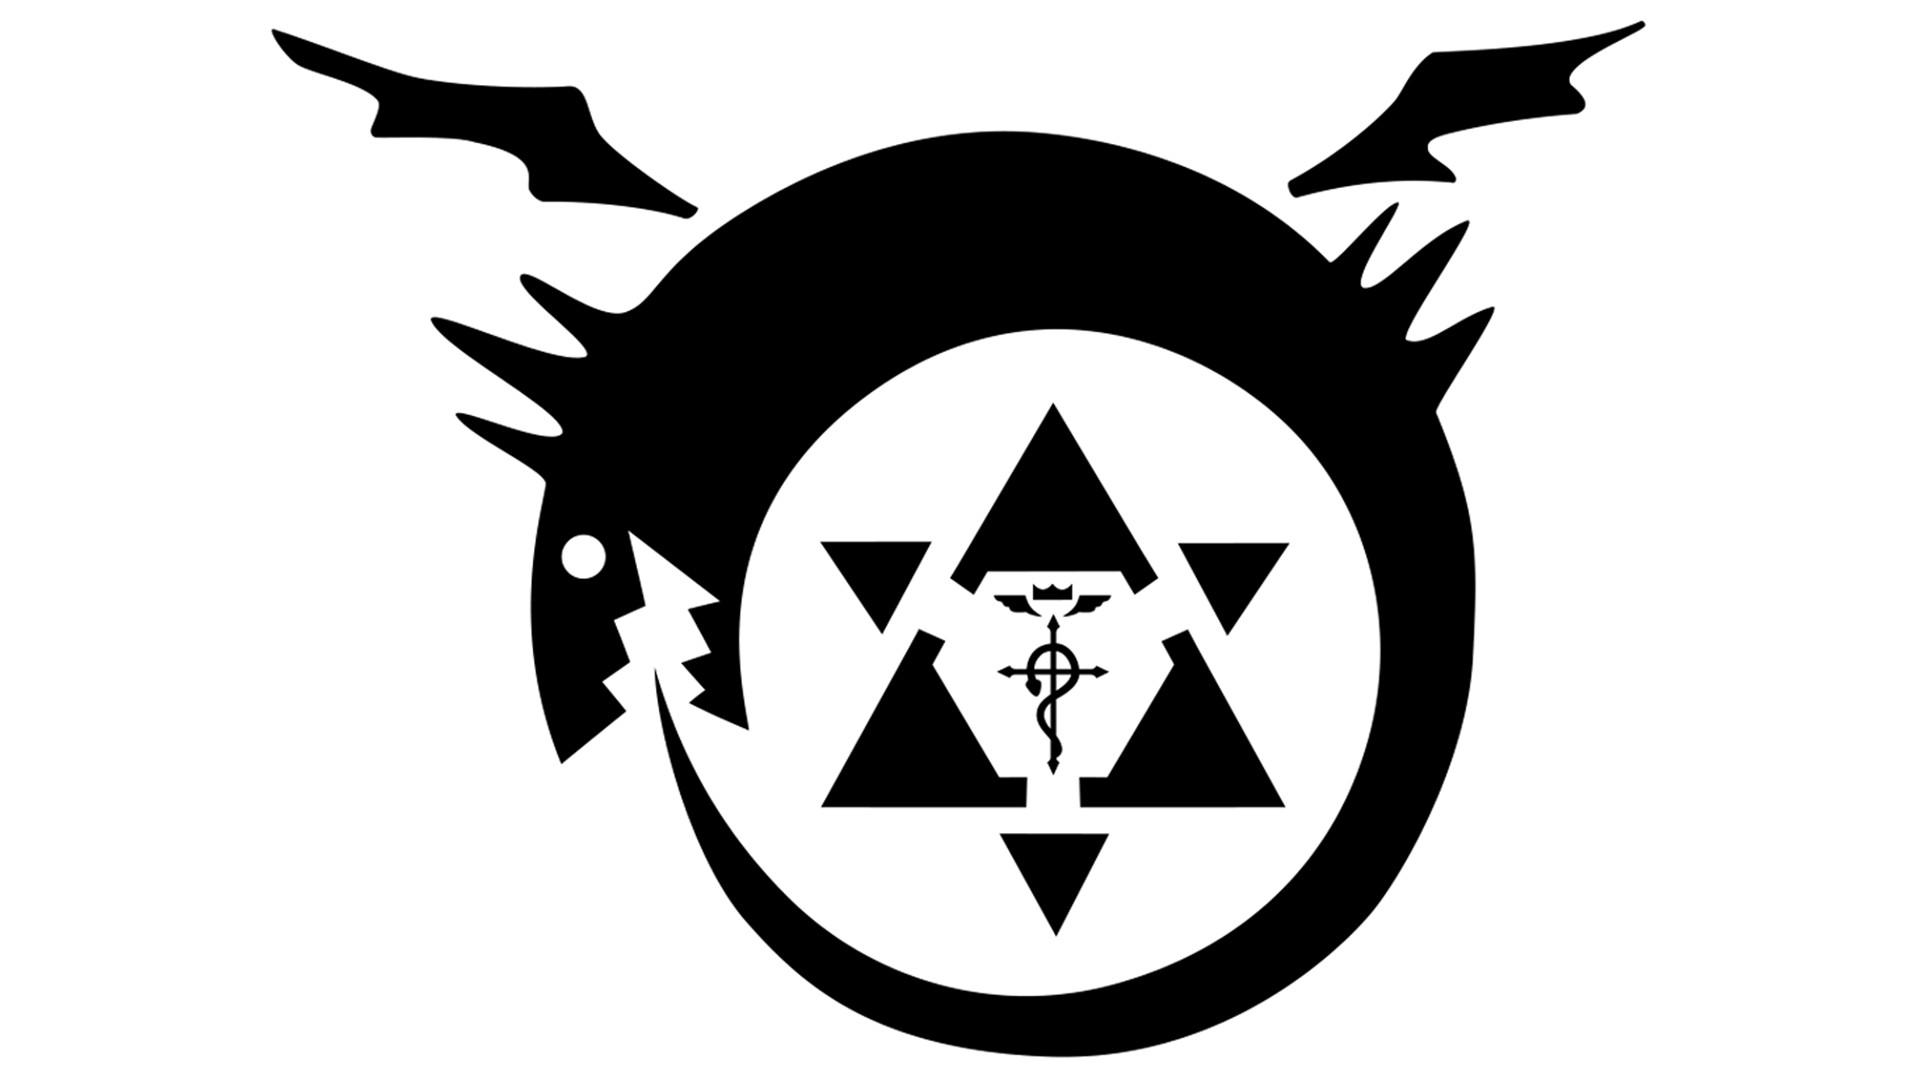 … fullmetal alchemist wallpapers hd wallpapercraft …